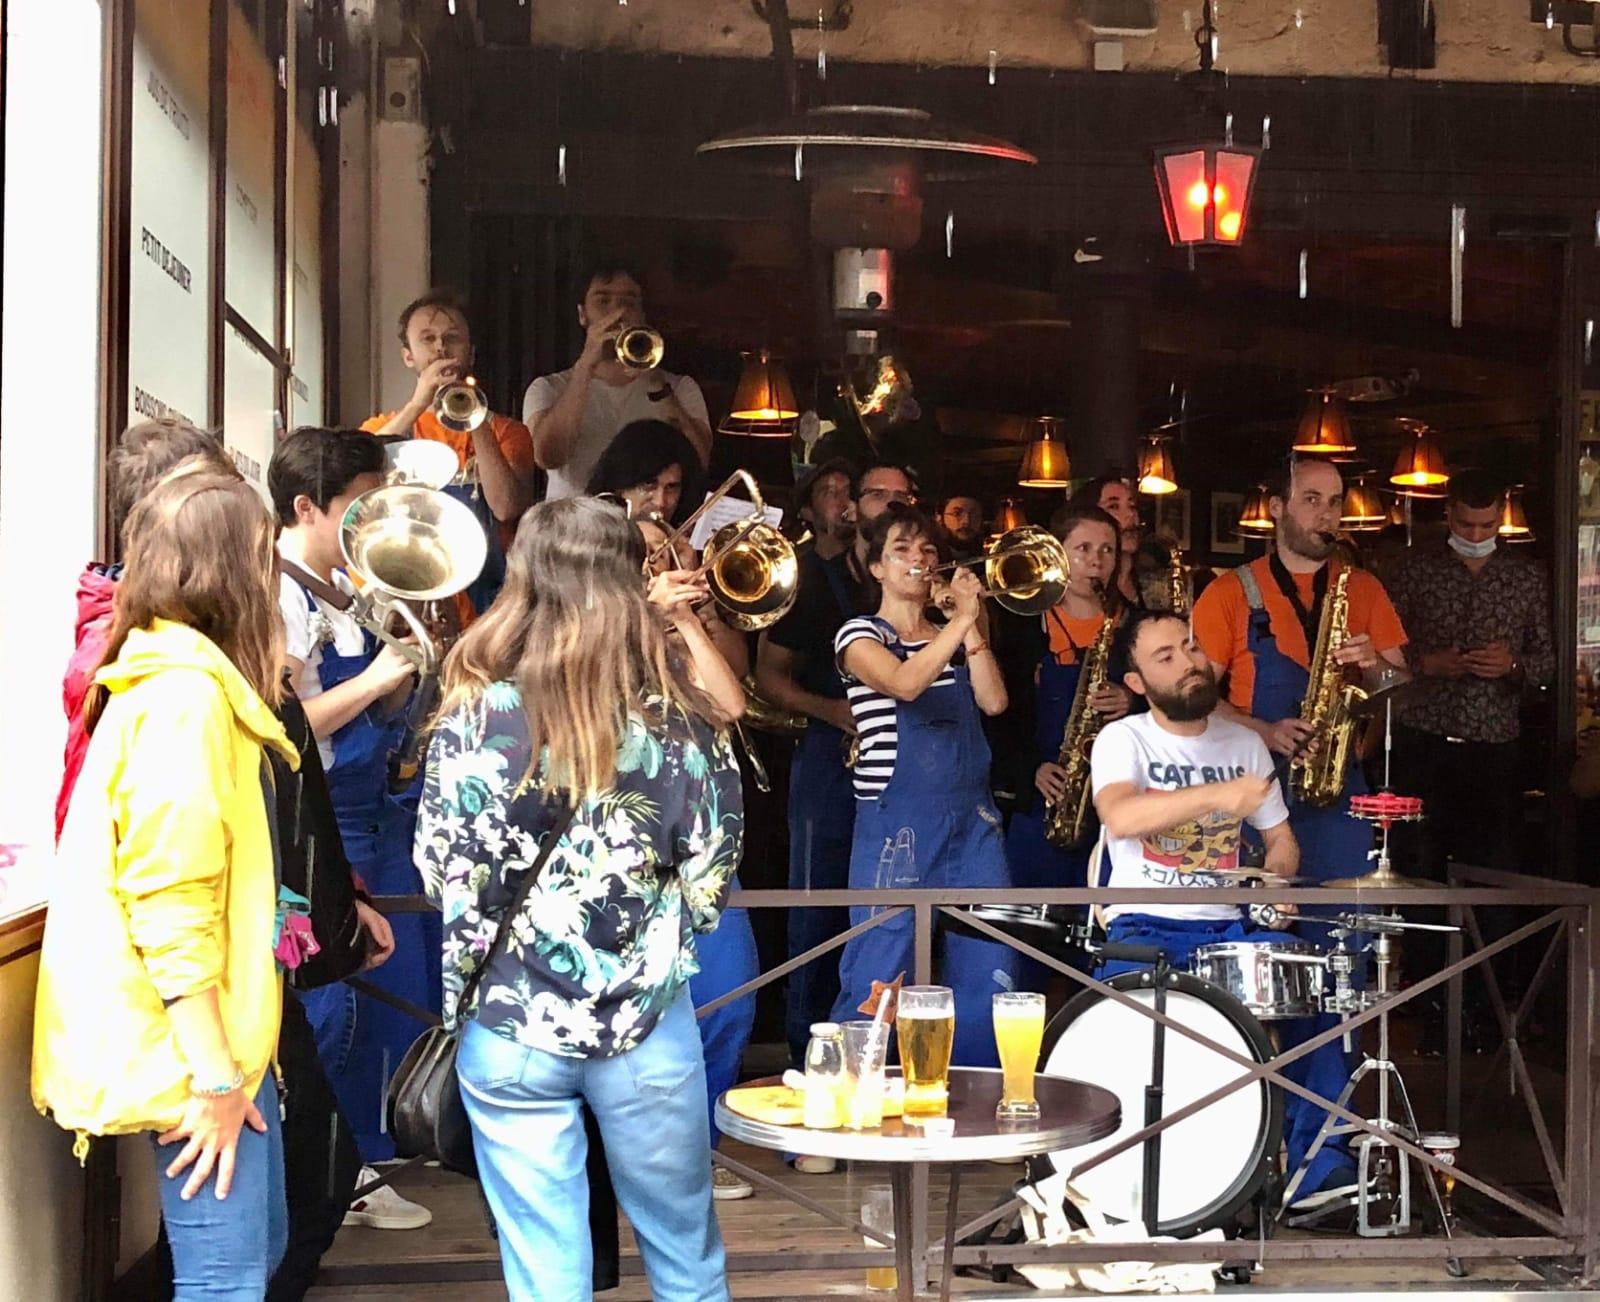 La Brass de Pneu, Fanfare festive Paris